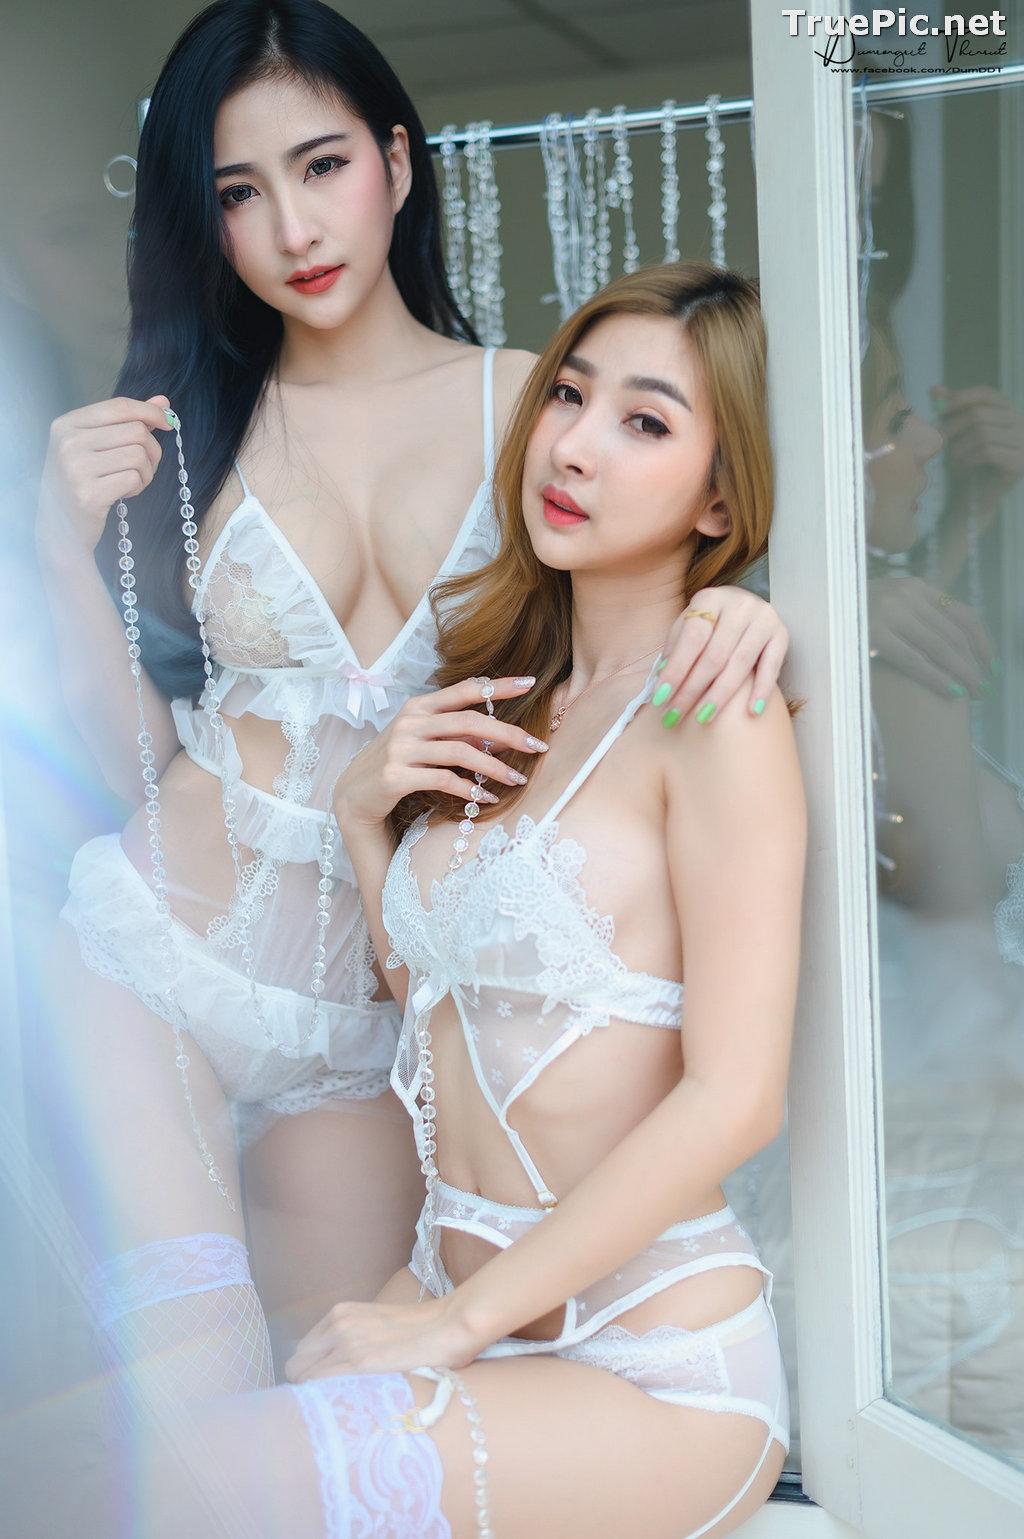 Image Thailand Model - Pattamaporn Keawkum & Anita Bunpan - Girls & Light - TruePic.net - Picture-6